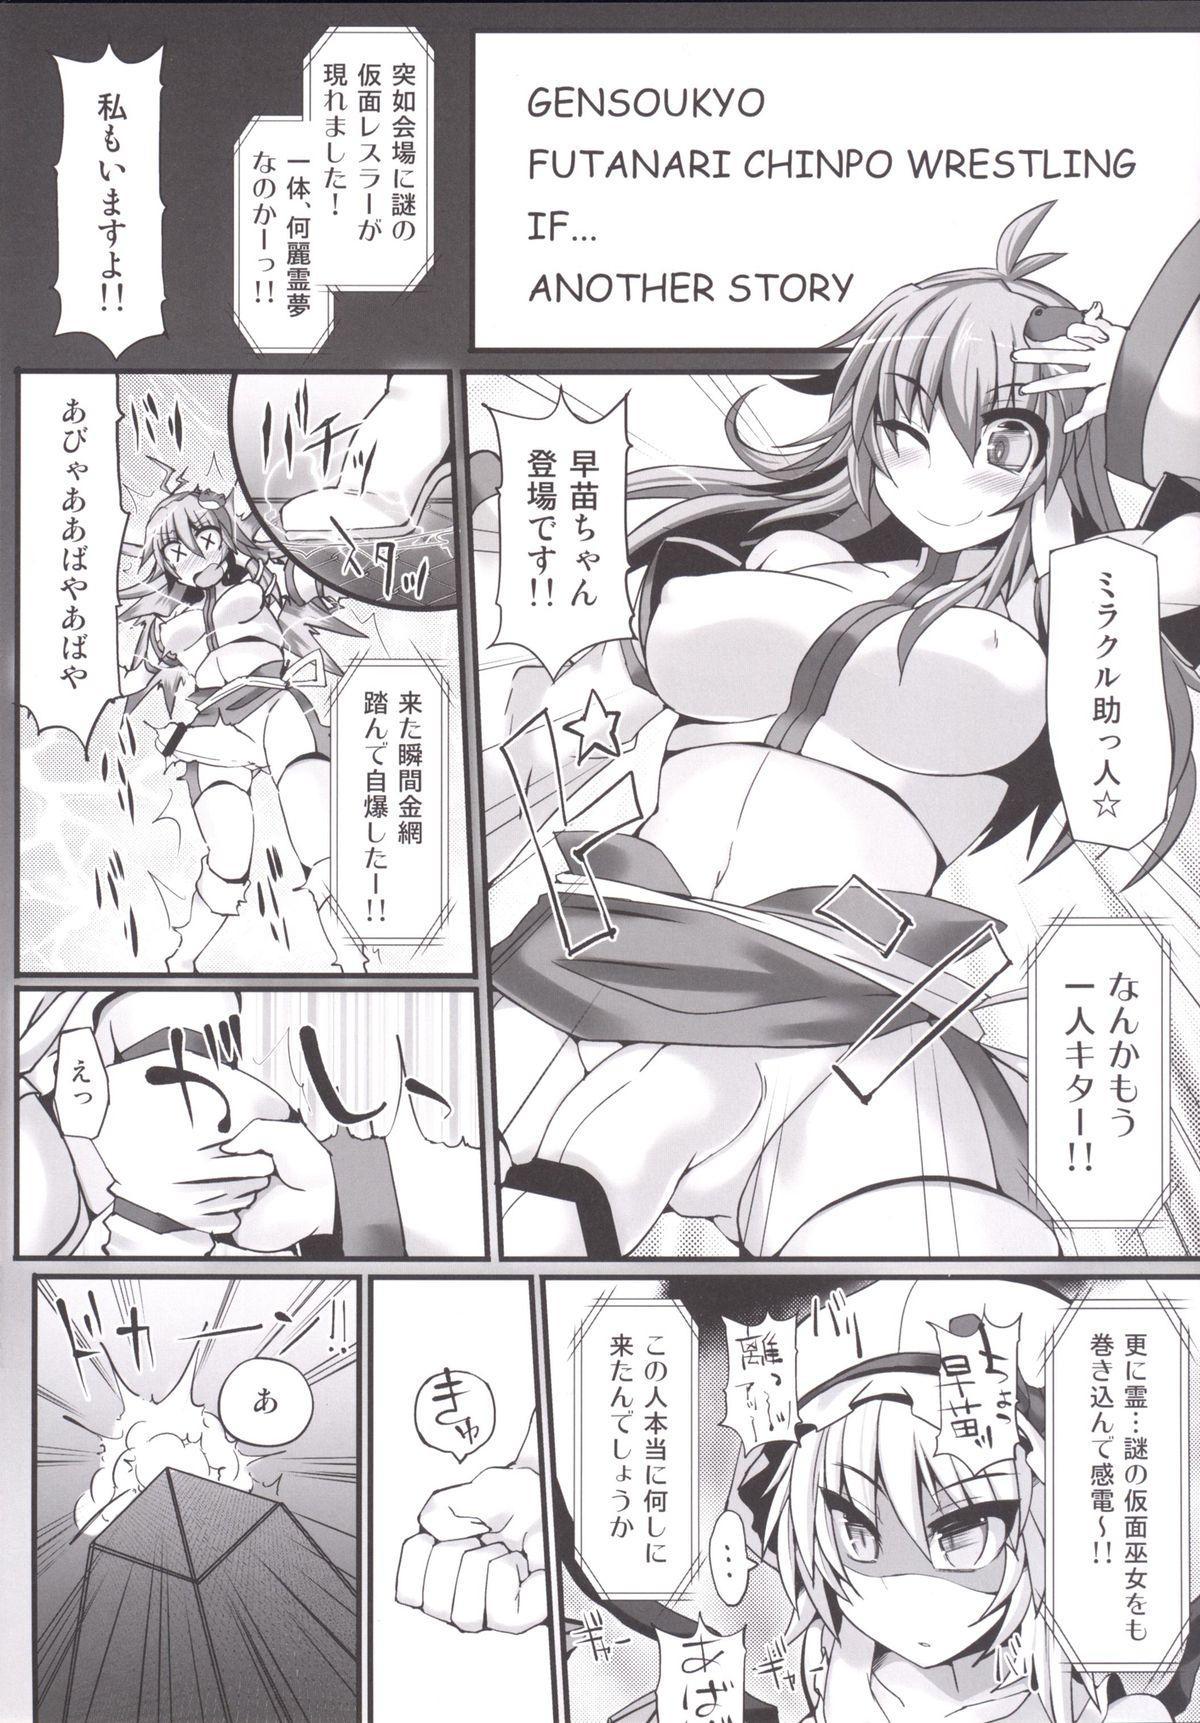 Gensoukyou Futanari Chinpo Wrestling 6 - Marisa VS Flandre 30